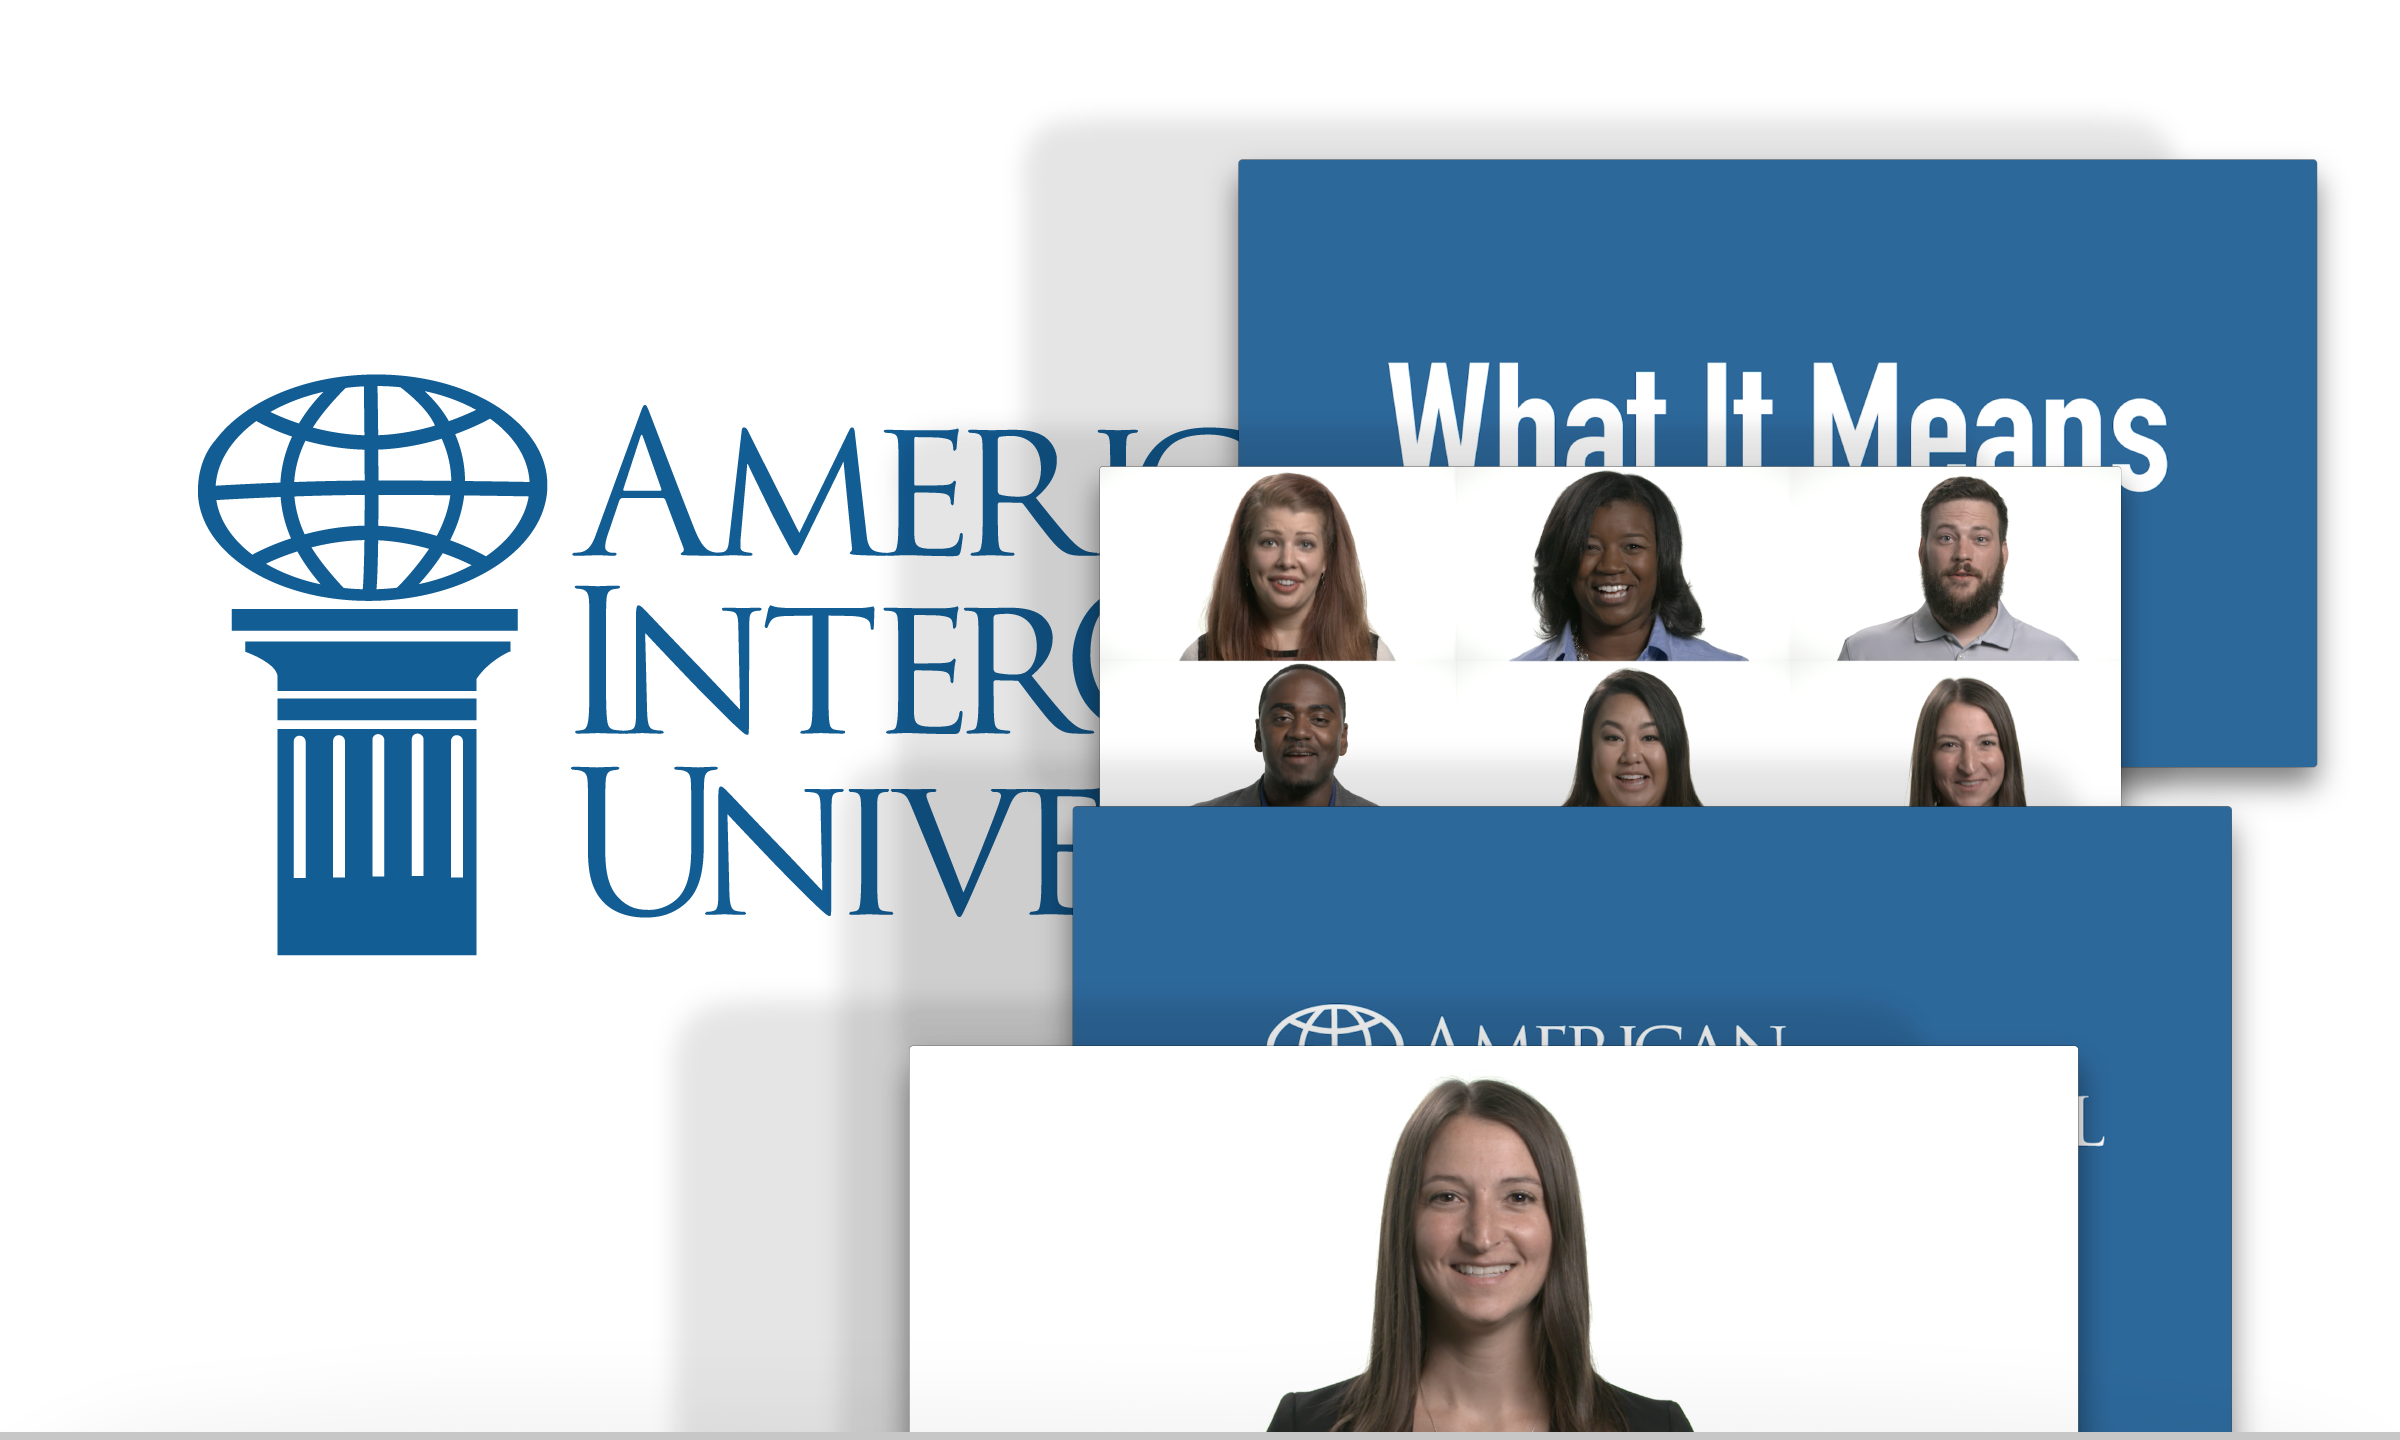 AIU Promotional Videos